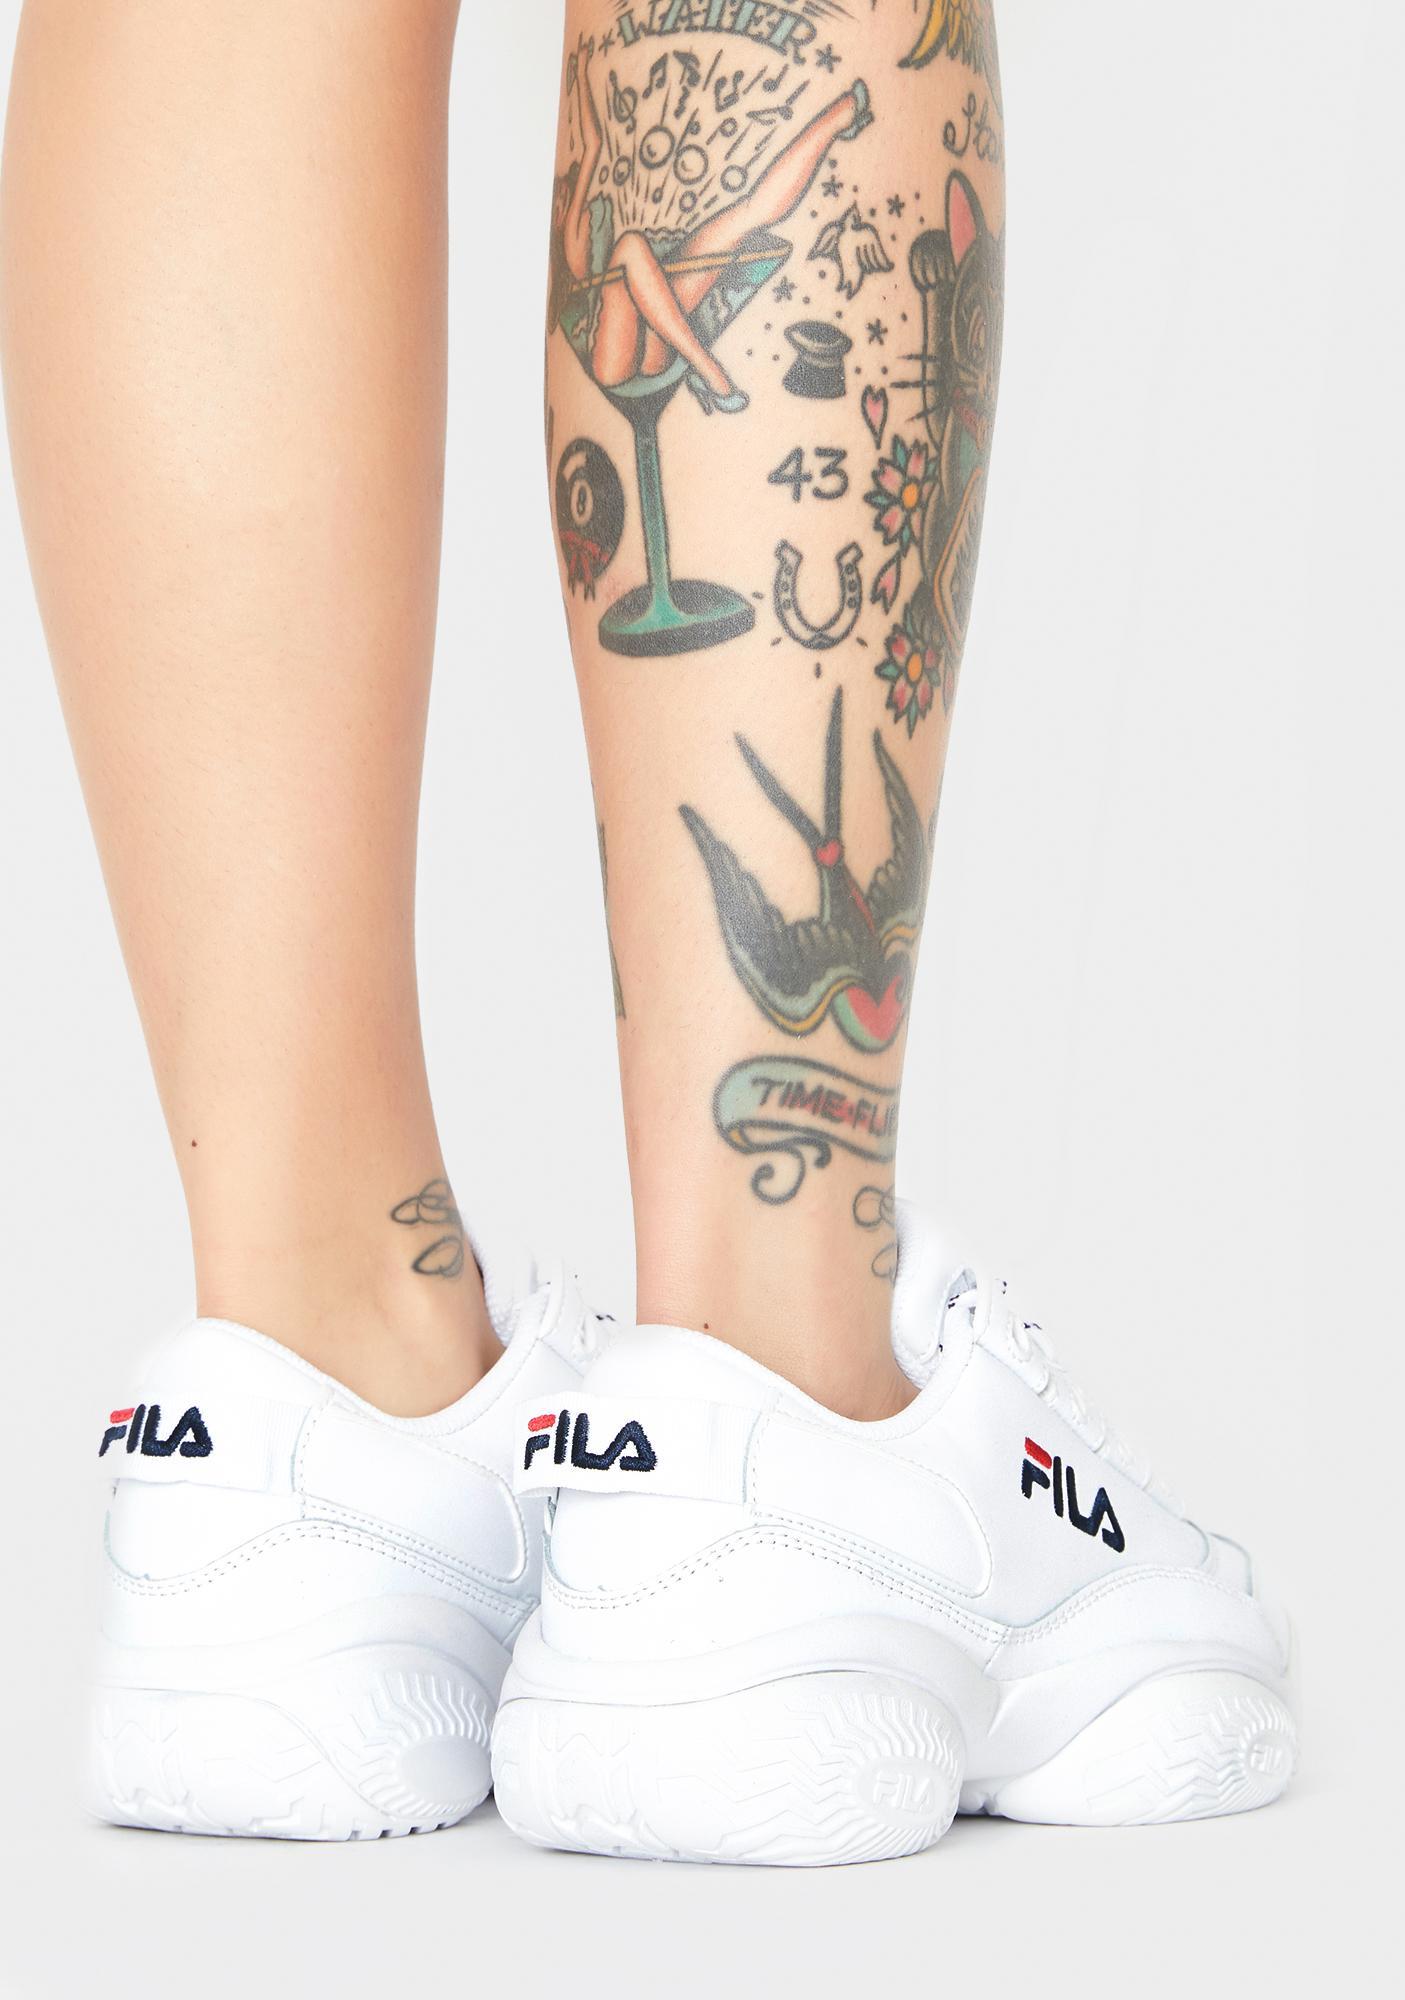 Fila Provenance Classic Sneakers